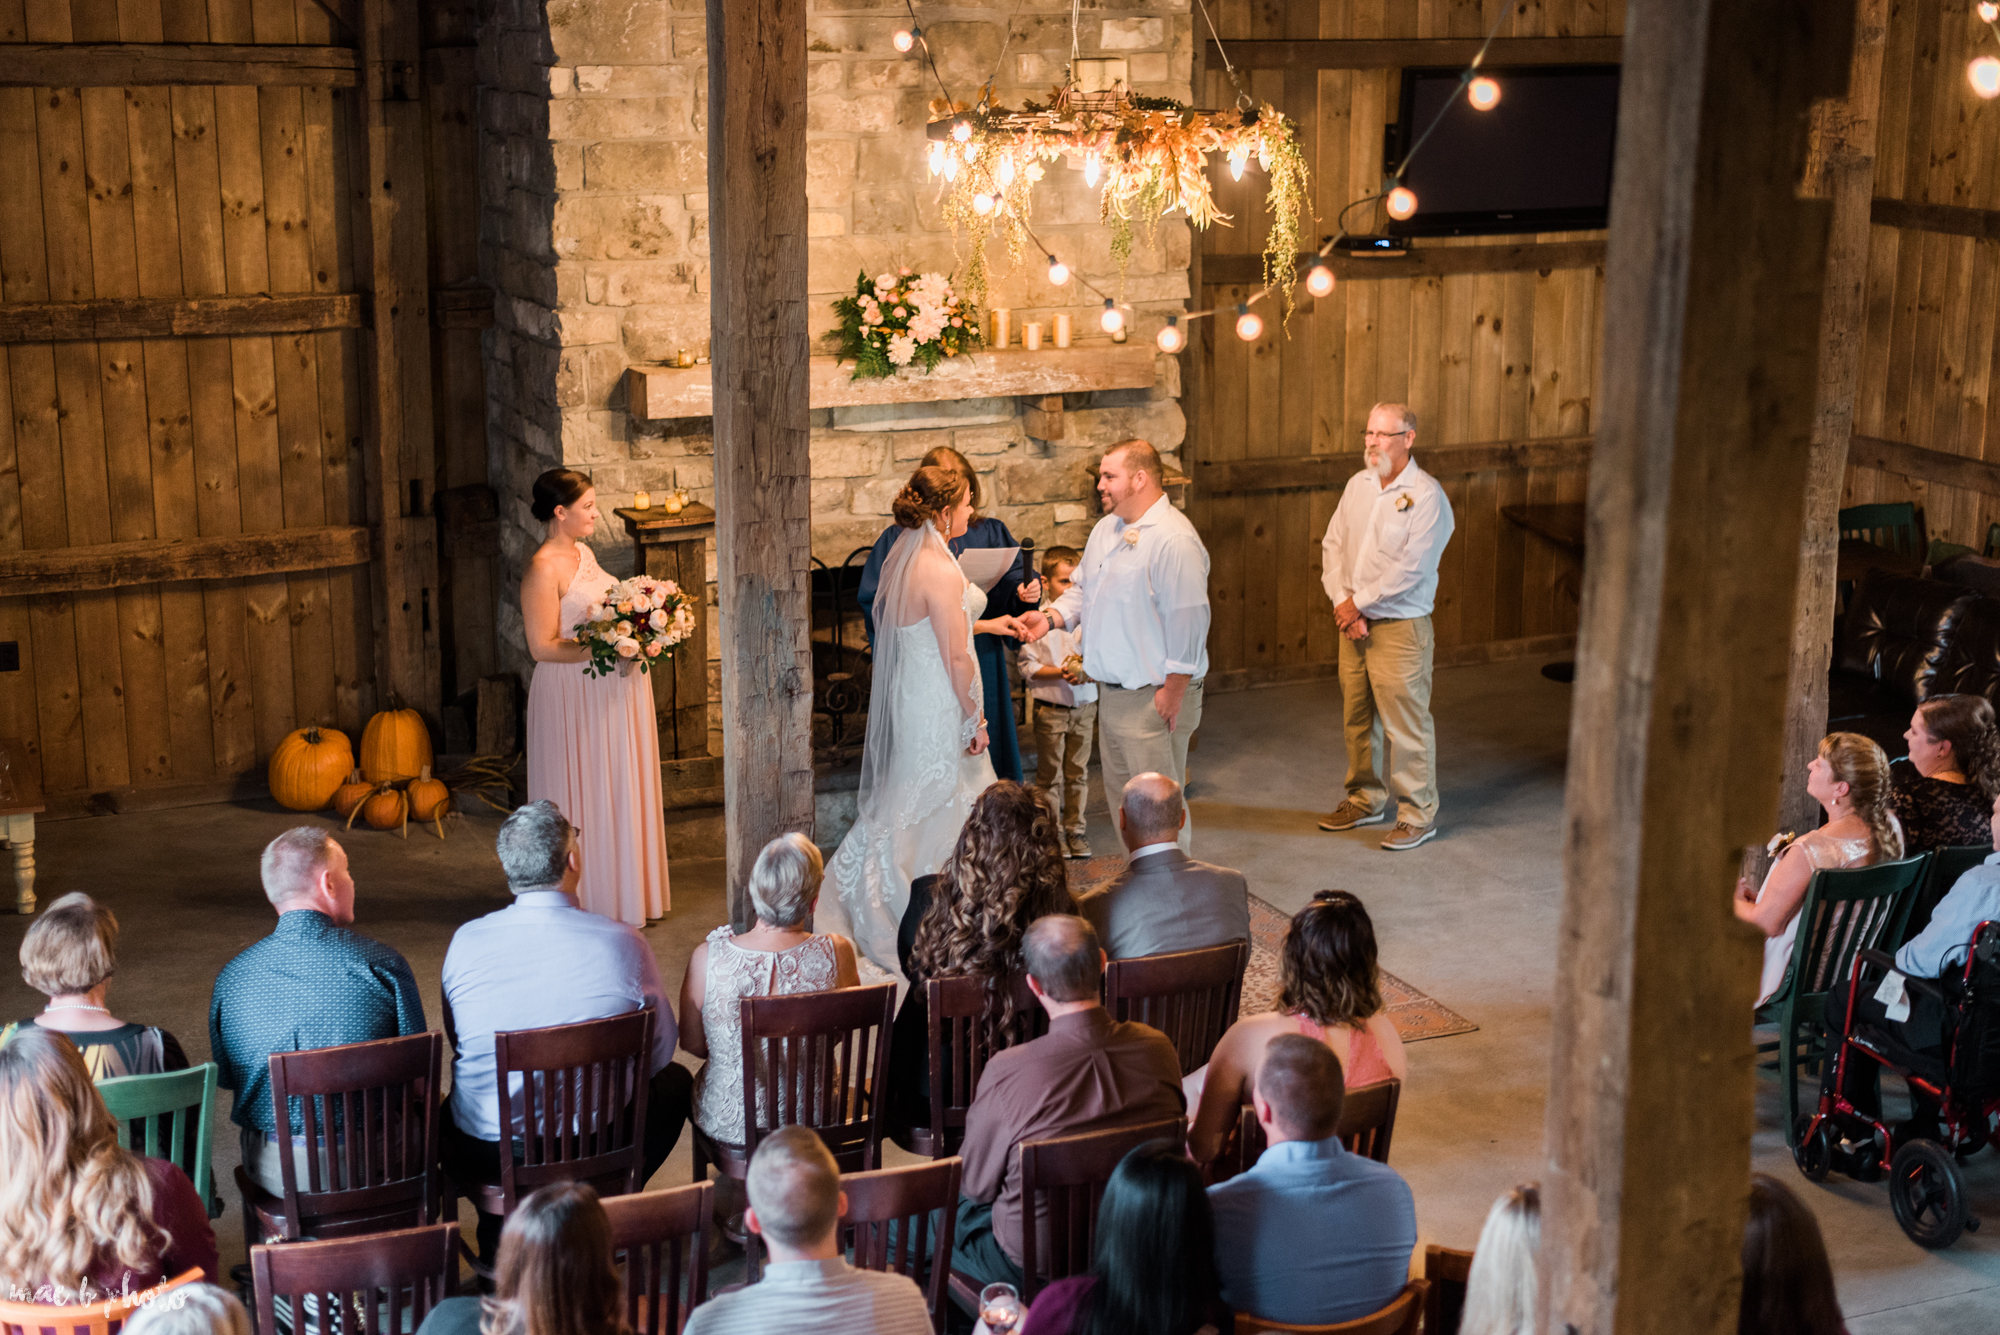 Sarah & Dustin's Rustic Chic Barn Wedding at Hartford Hill Winery in Hartford, Ohio by Mae B Photo-45.jpg